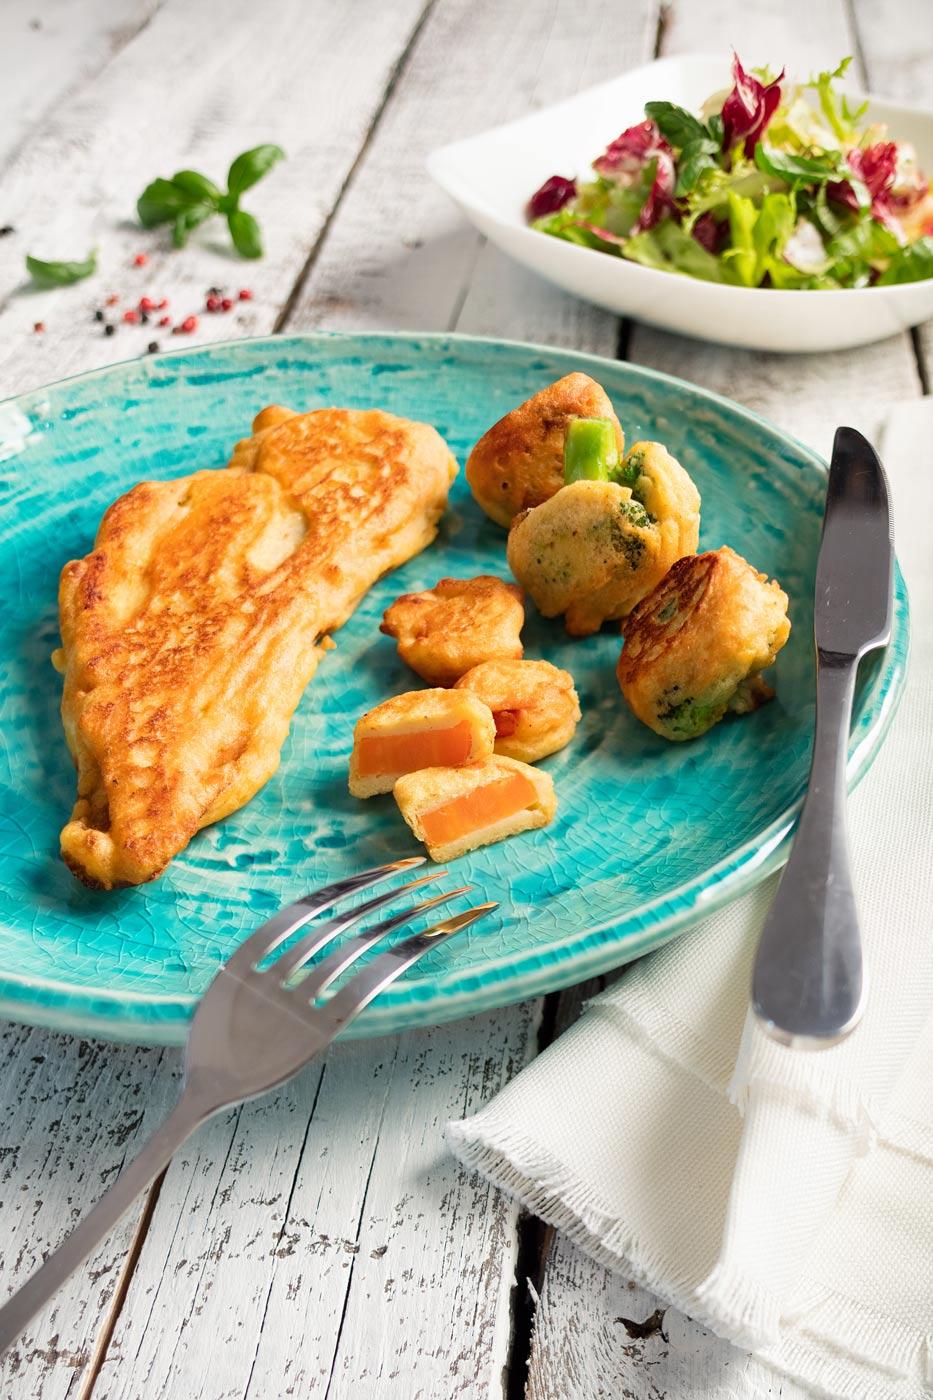 Recipe image of fried vegetables